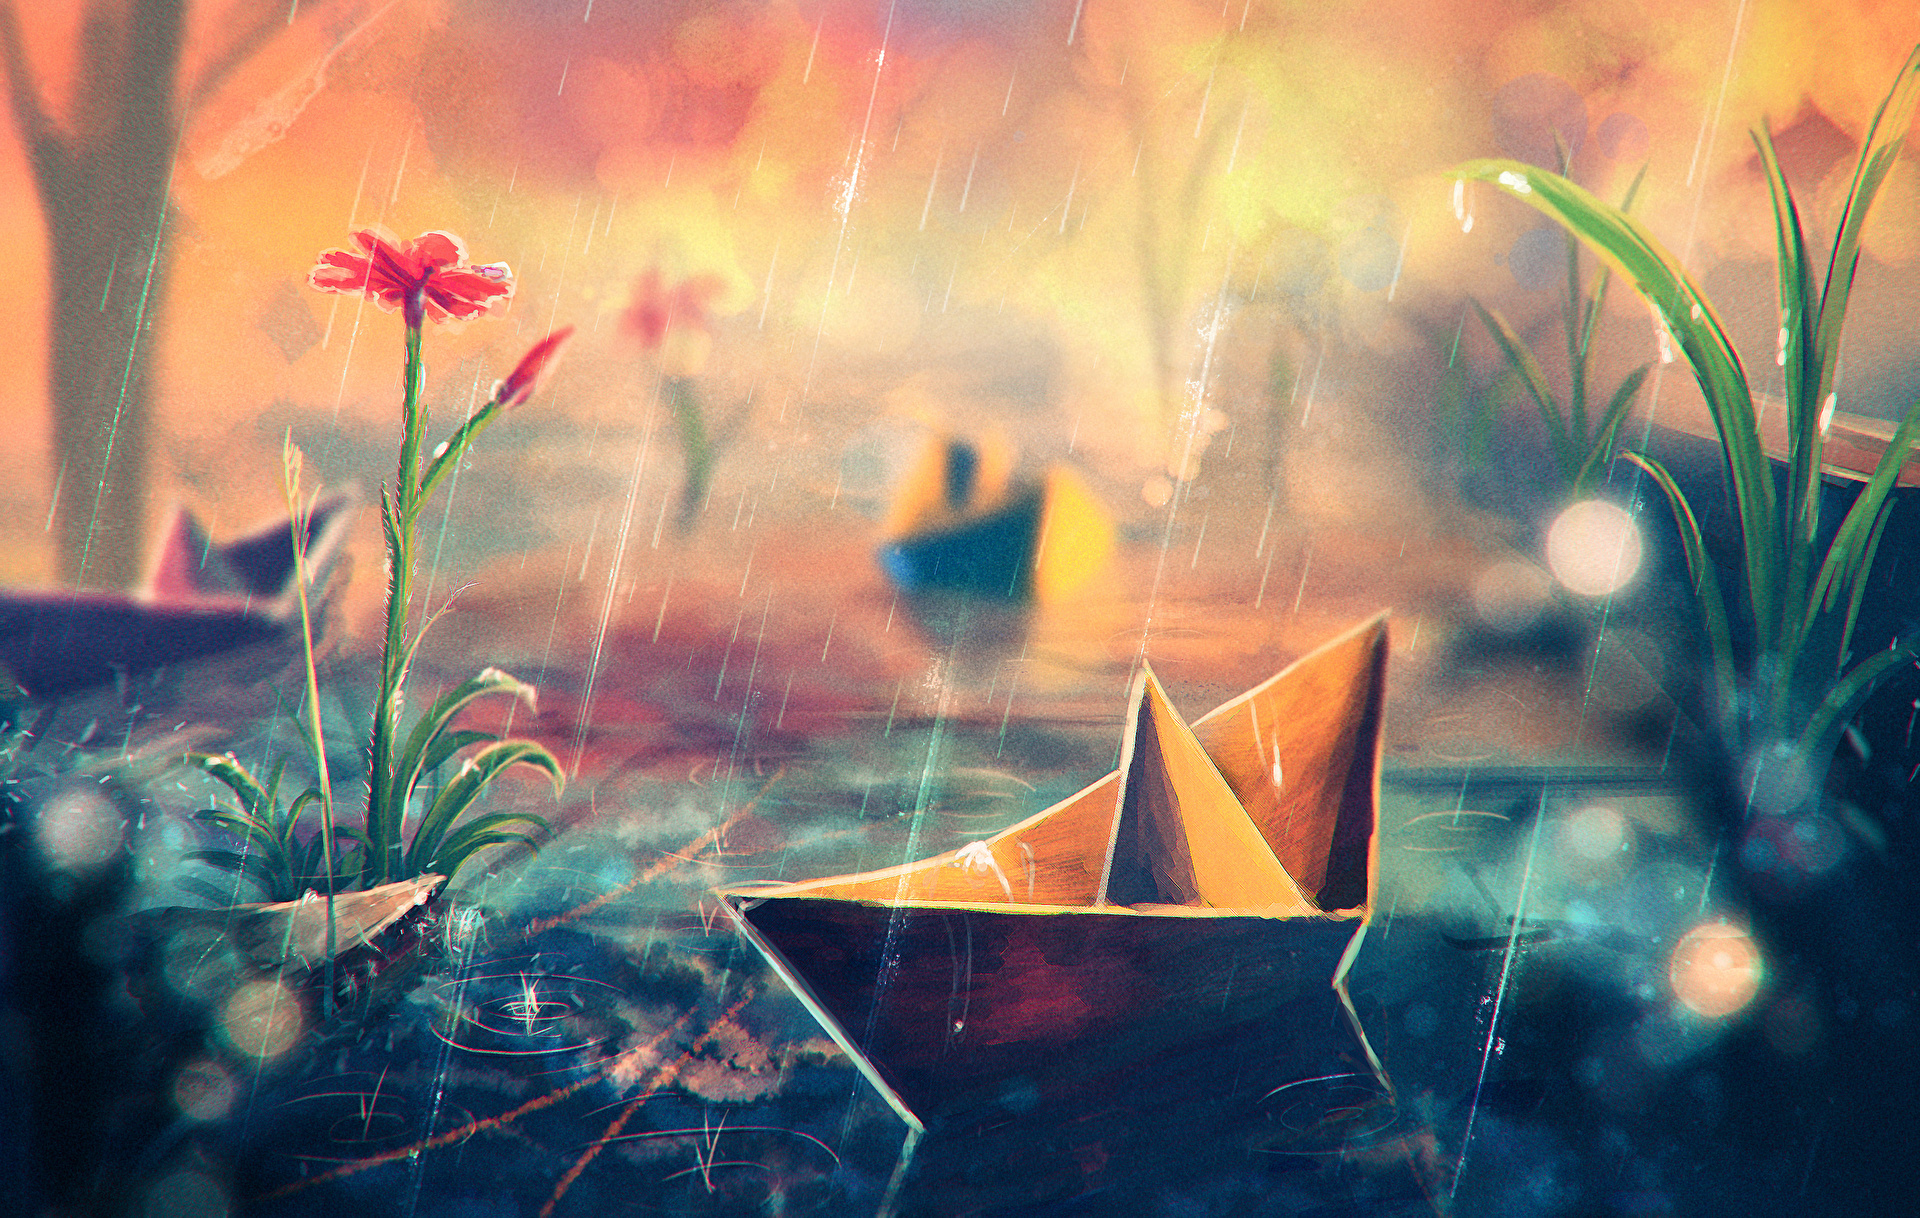 Images Origami Paper Boat Fantasy Rain Flower 2560x1625